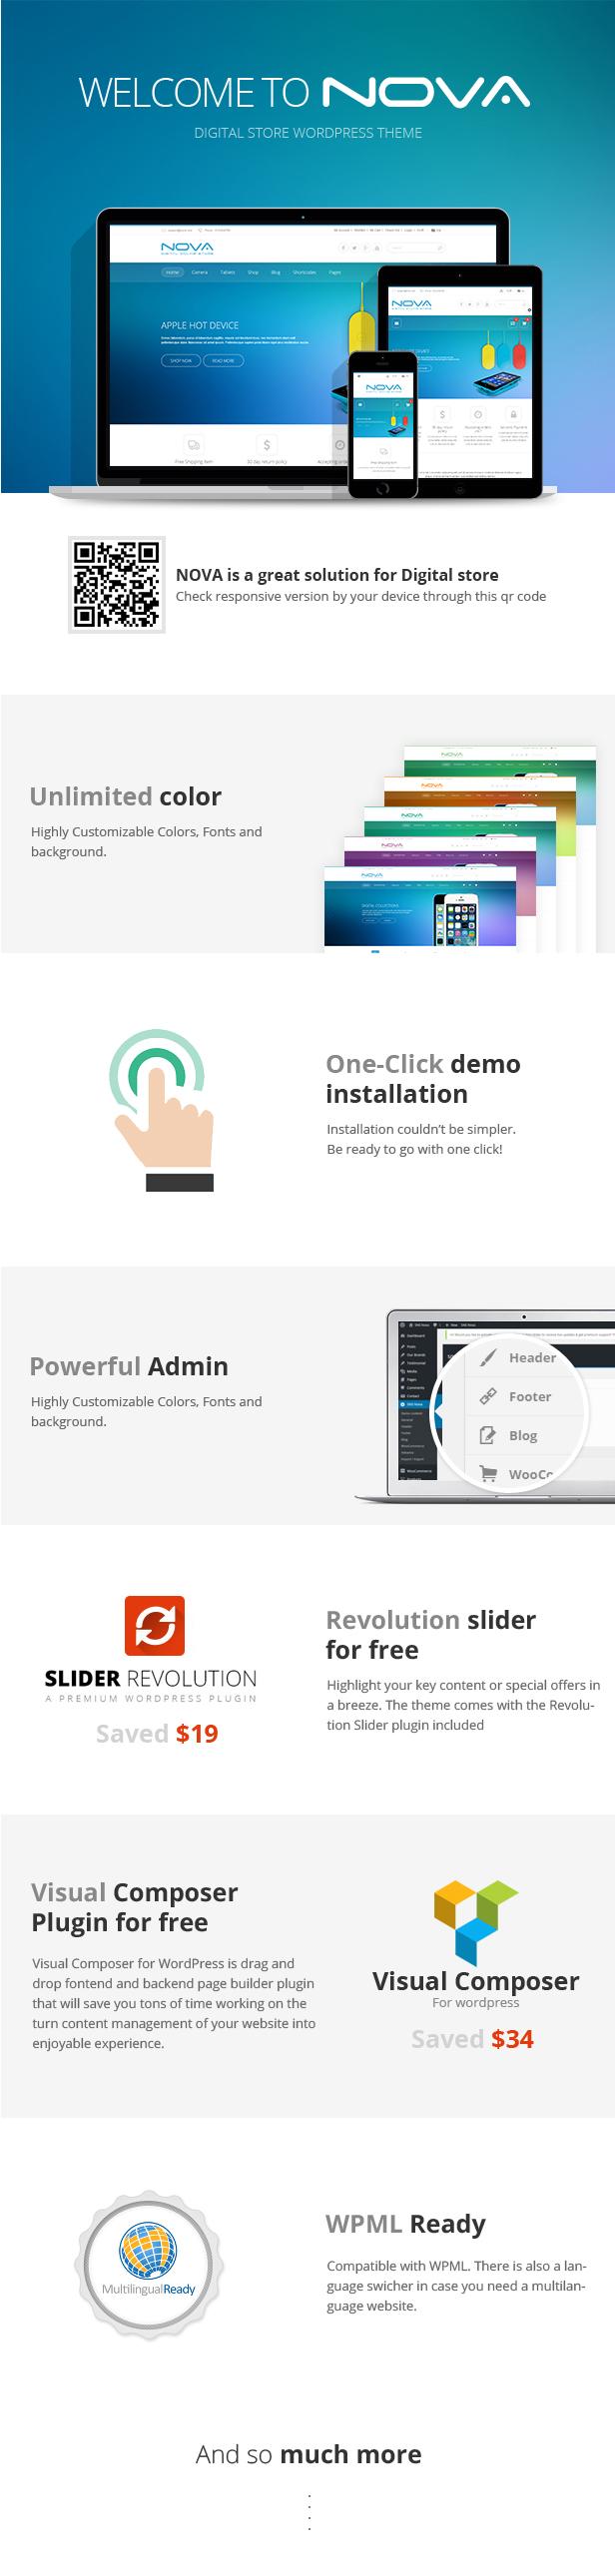 SNS Nova - Digital Store WordPress Theme - 3